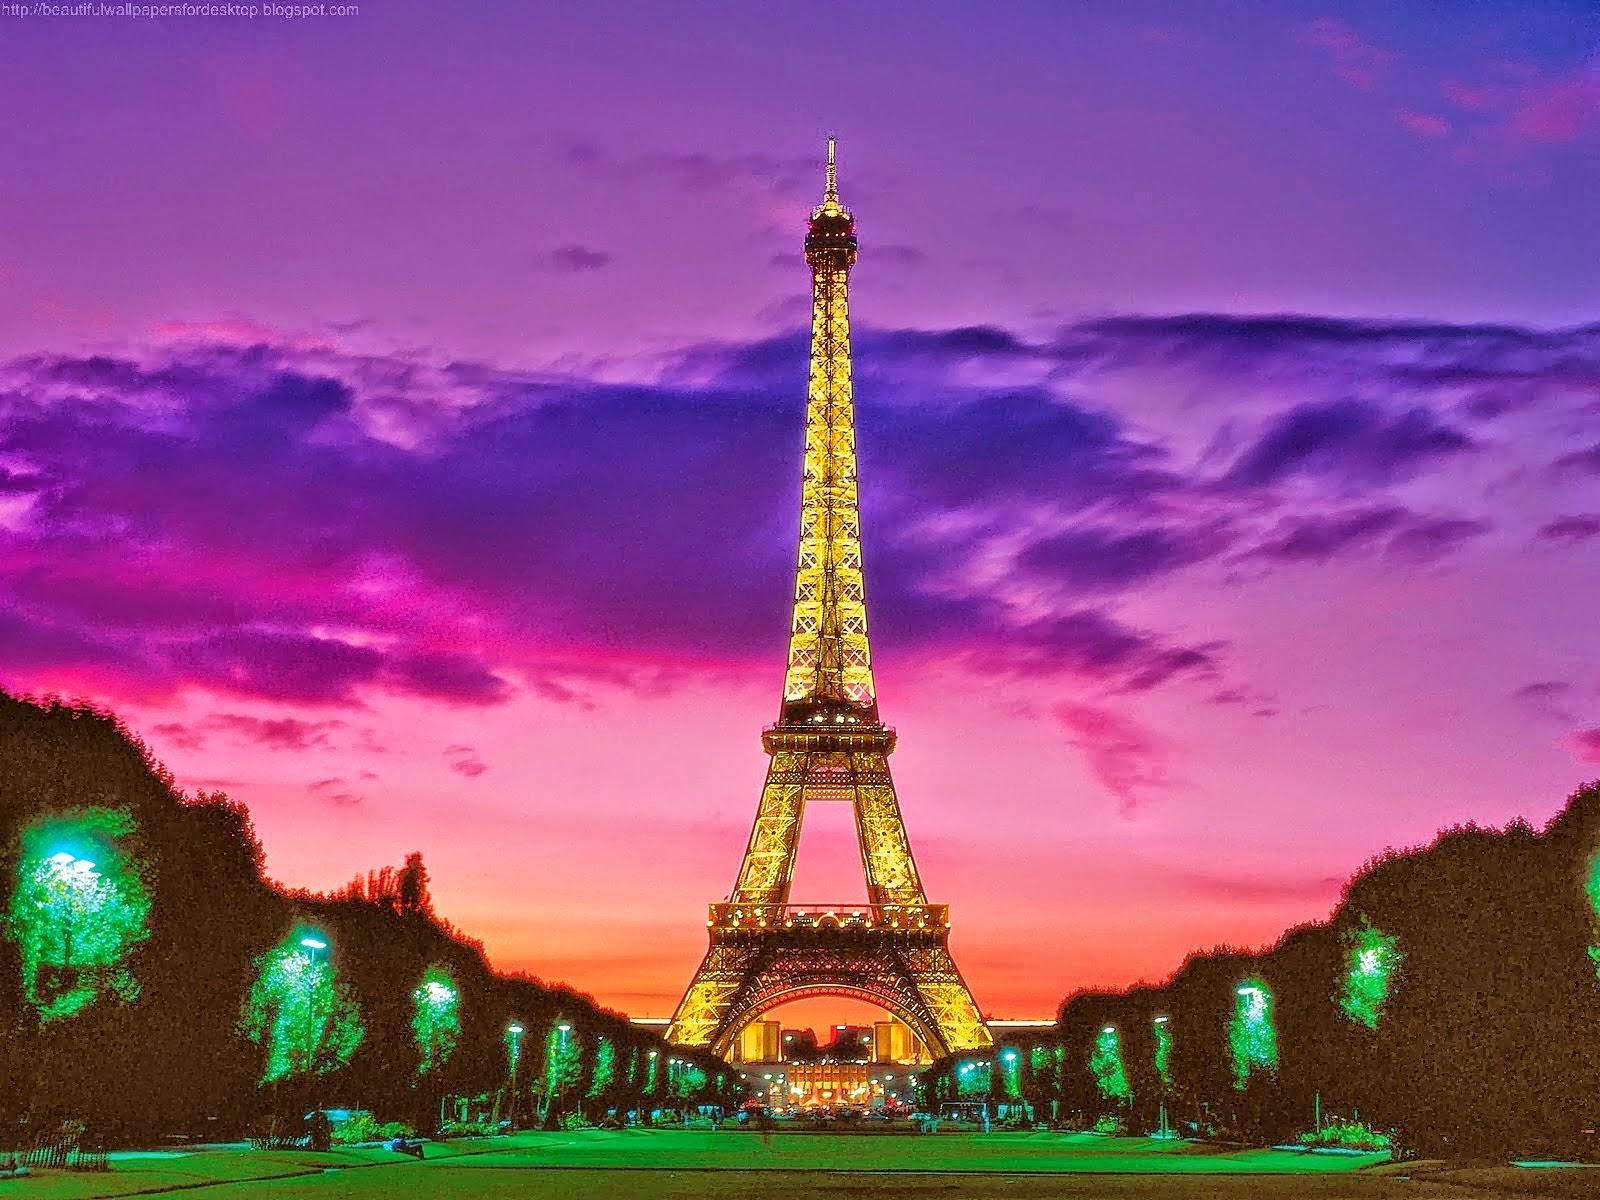 Sunset Eiffel Tower At Night 1600x1200 Download Hd Wallpaper Wallpapertip